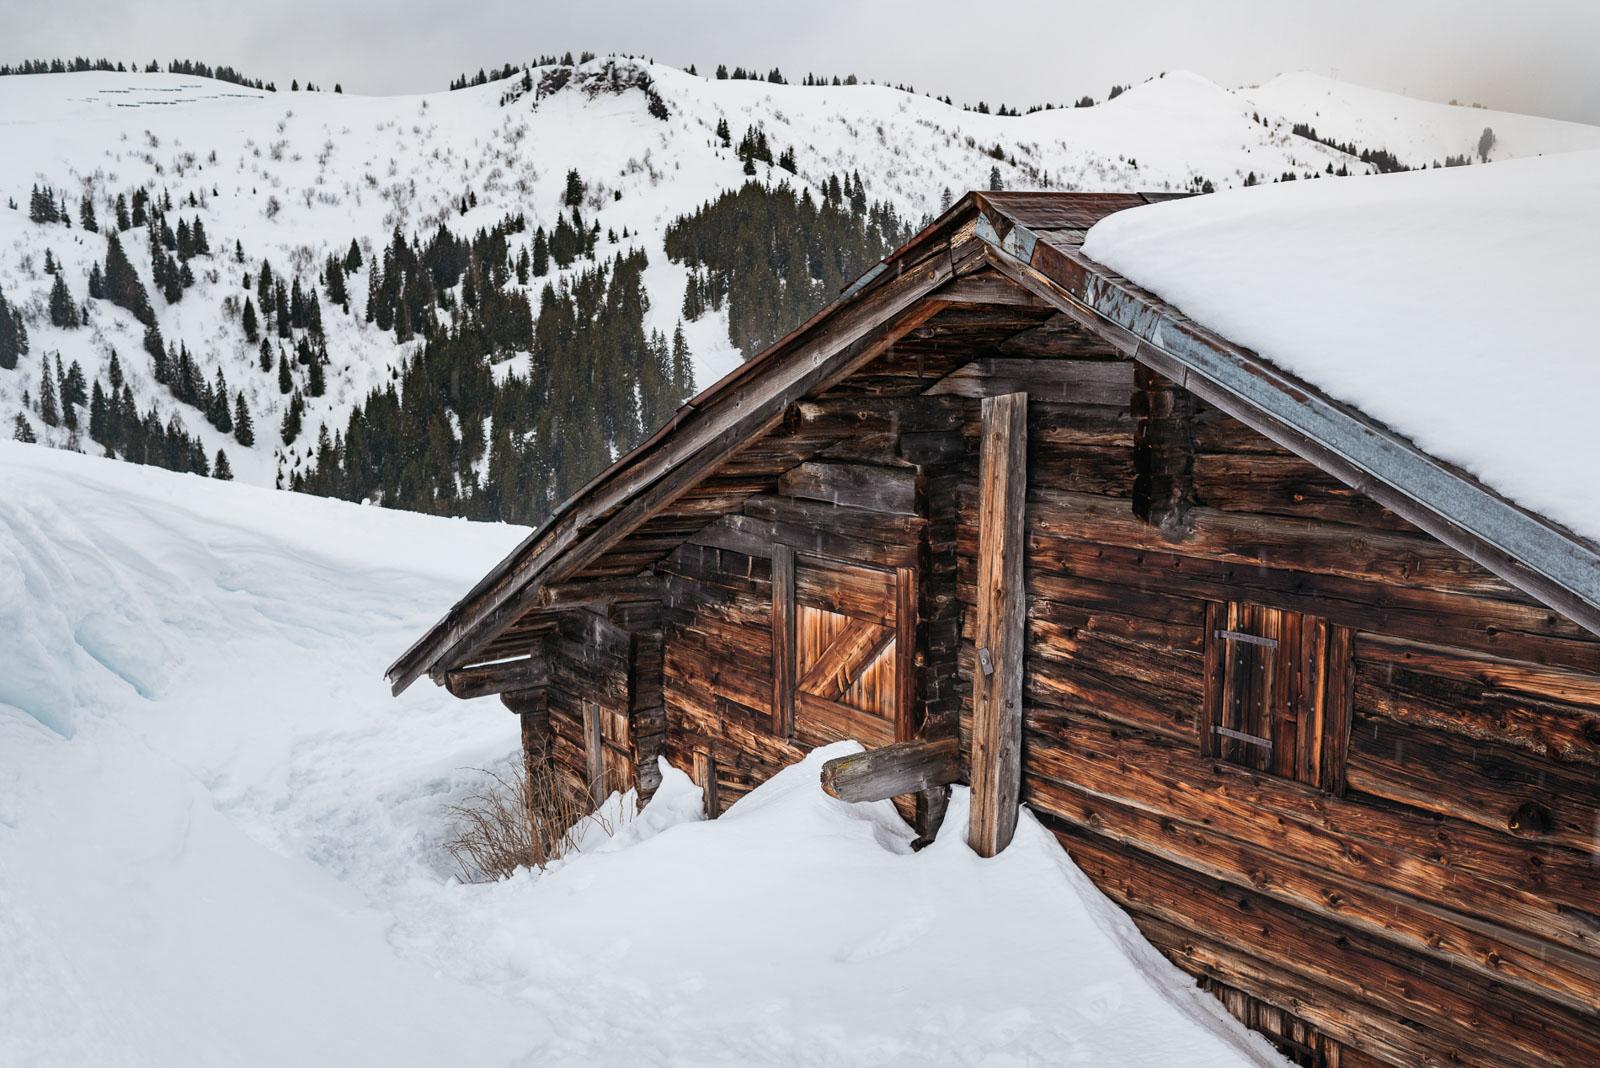 Chalet Alpage Winter - Reportage Photo - Victor Perez - Atelier VE-2.jpg